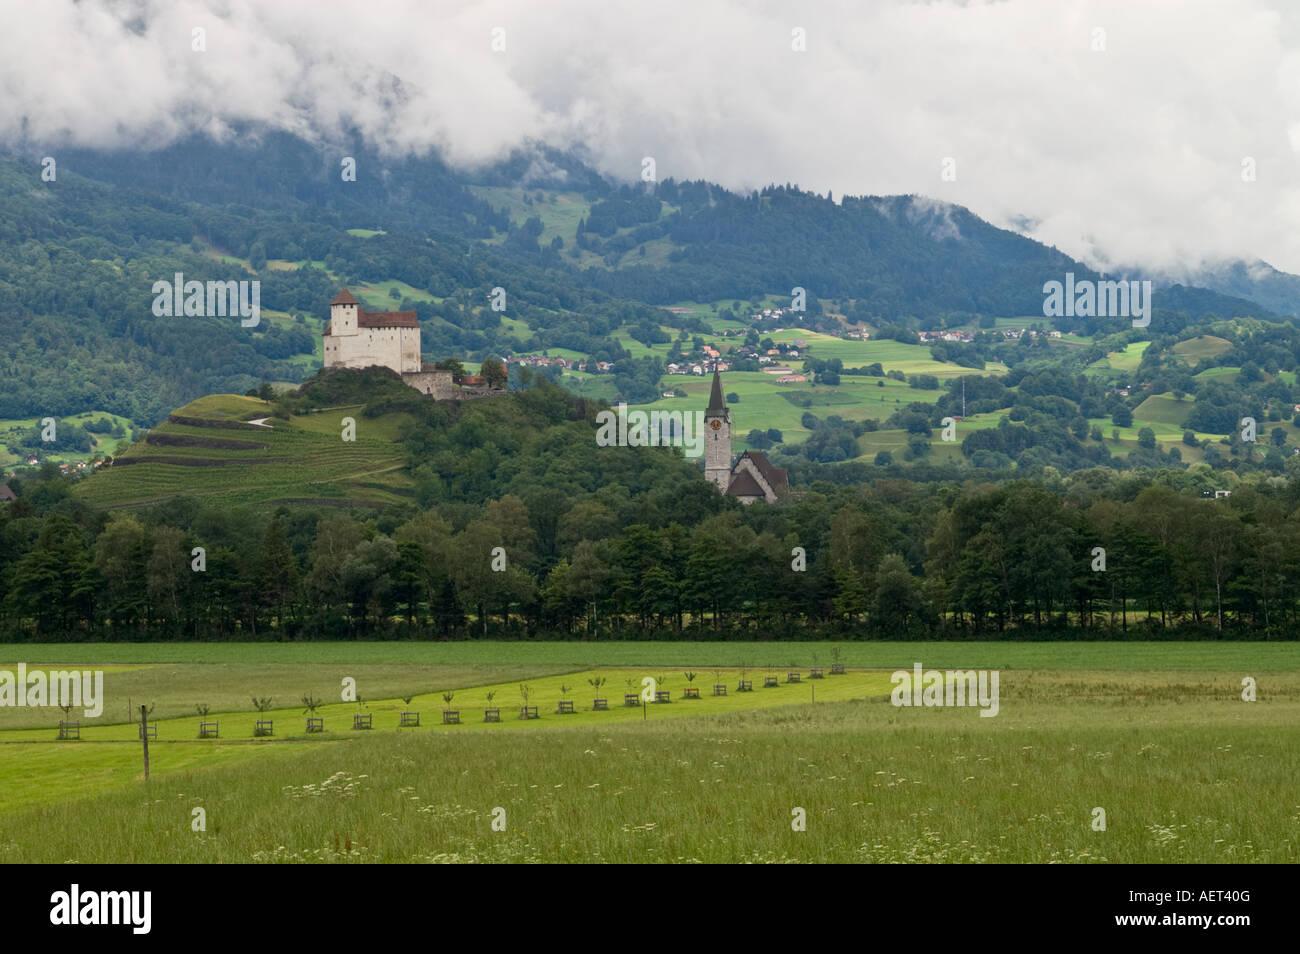 Castle in small town Balzers in principality of Liechtenstein. Stock Photo